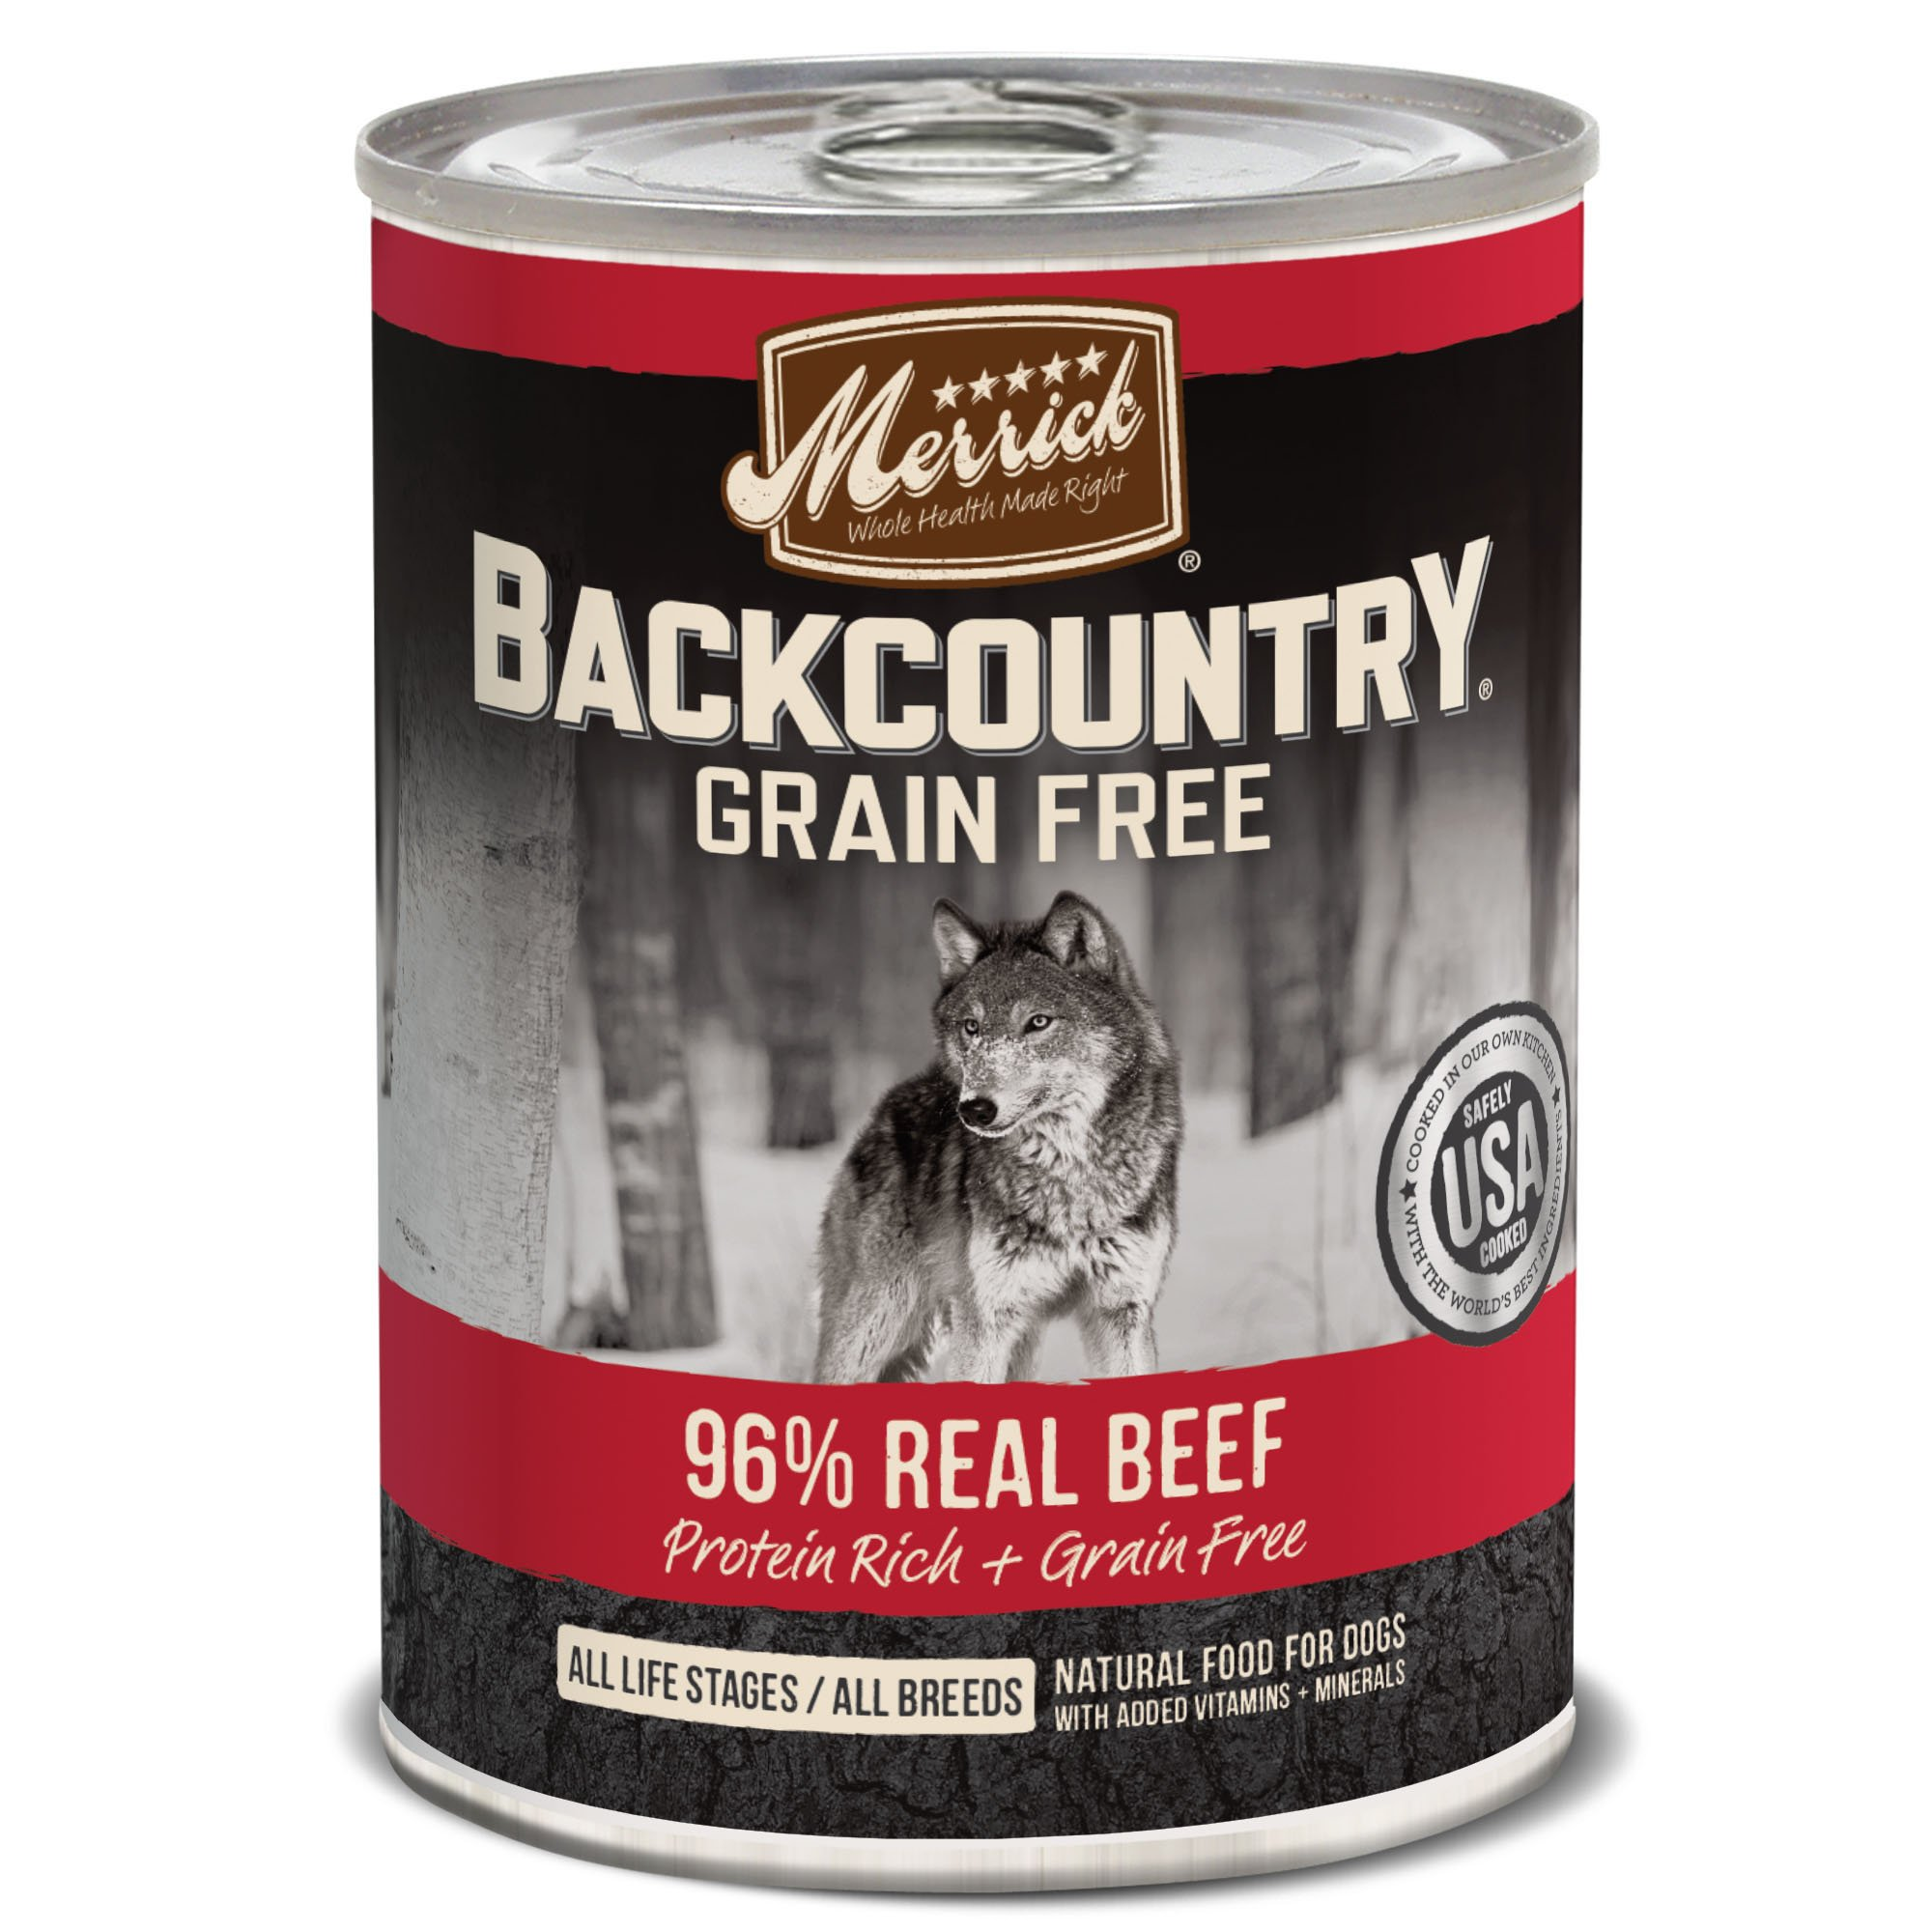 Merrick Backcountry Grain Free 96% - Real Beef Wet Dog Food, Case Of 12, 12.7 Oz. by Merrick